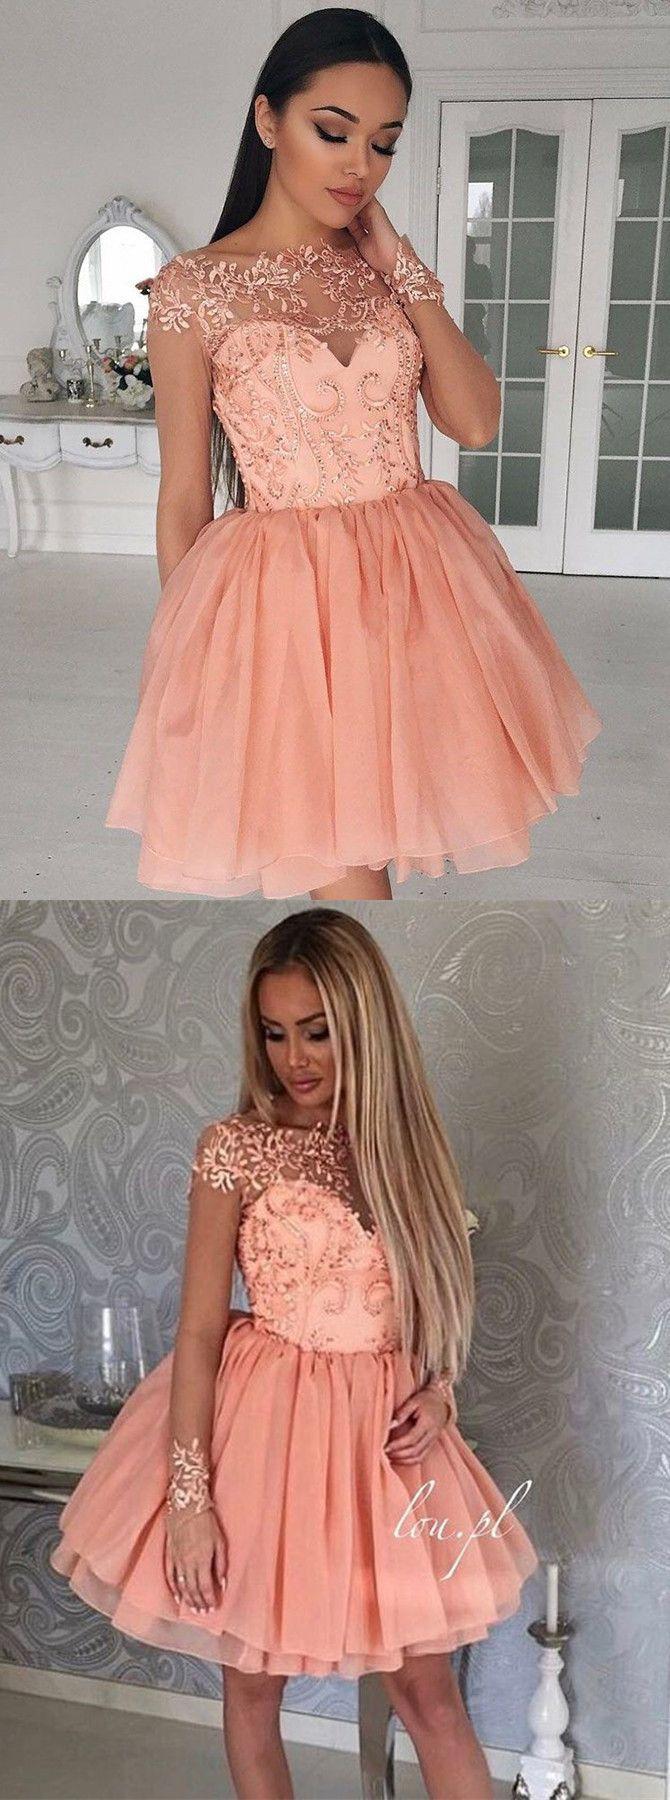 2017 homecoming dresses,homecoming dresses short,beaded homecoming dresses,coral homecoming dresses